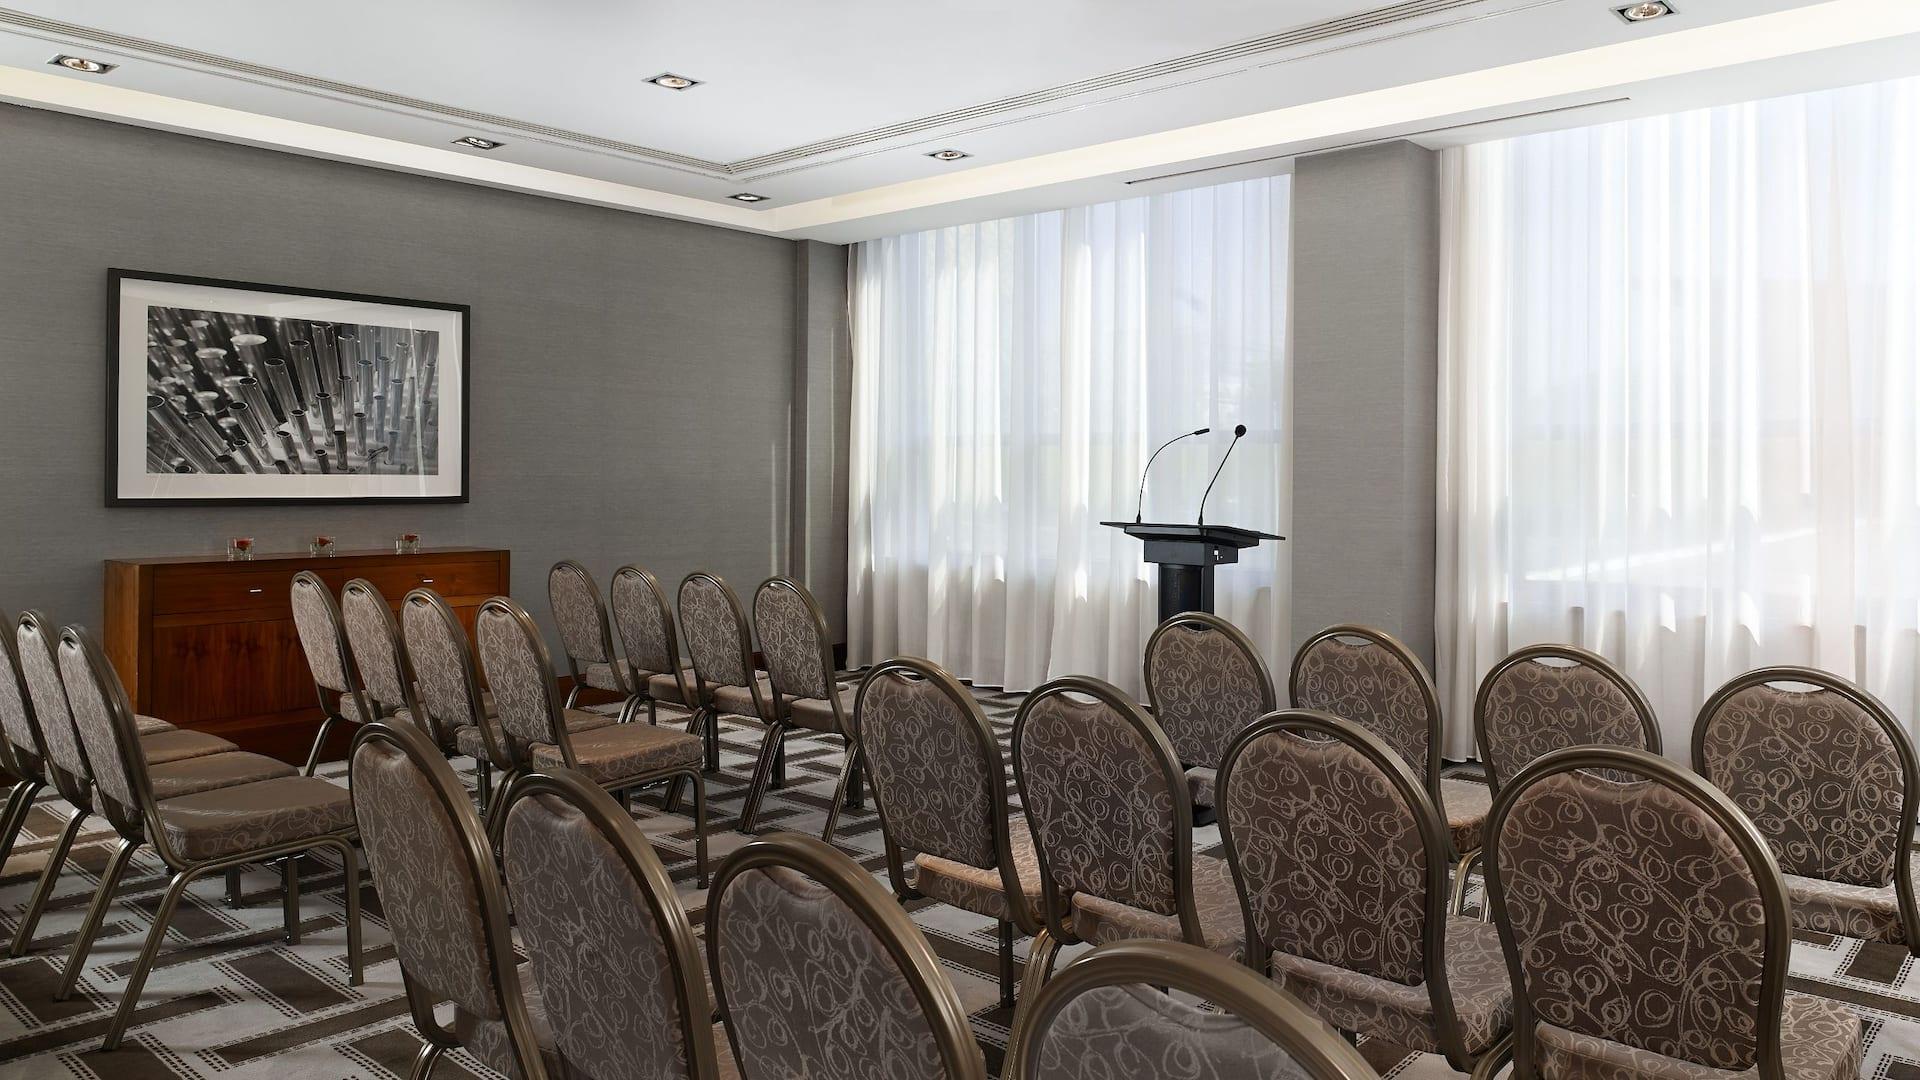 Meeting room setup at Hyatt Regency Birmingham